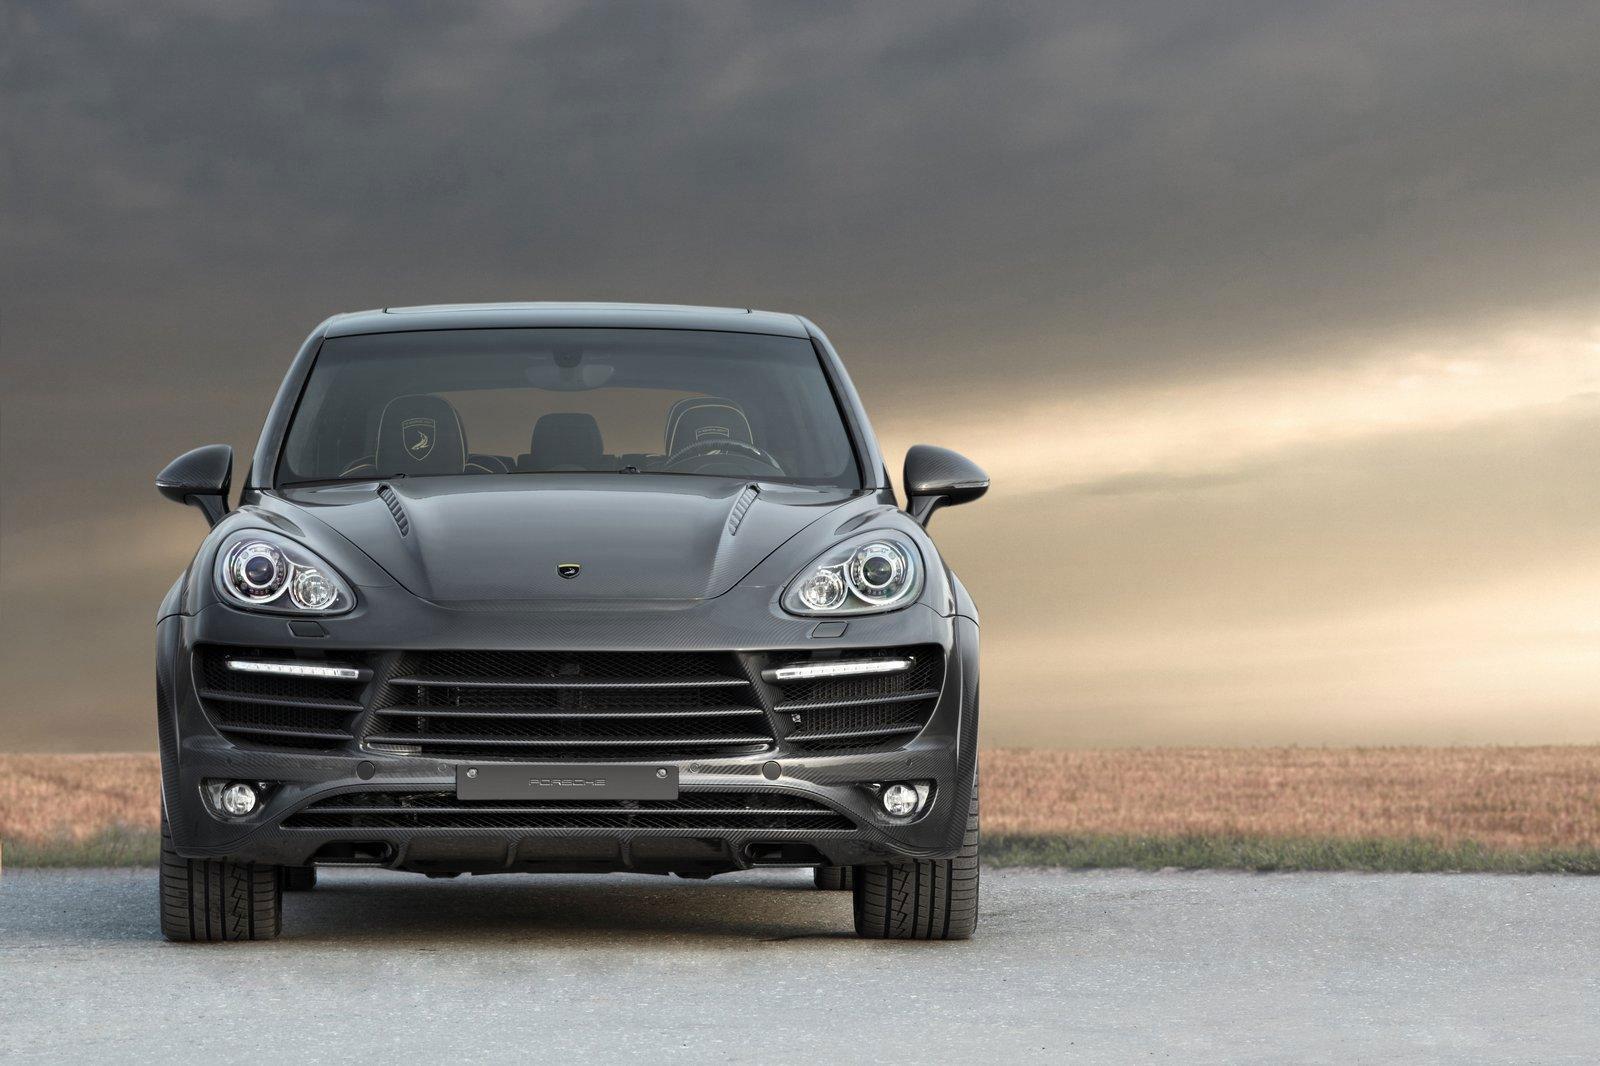 Porsche Cayenne Vantage 2 Carbon Edition 4